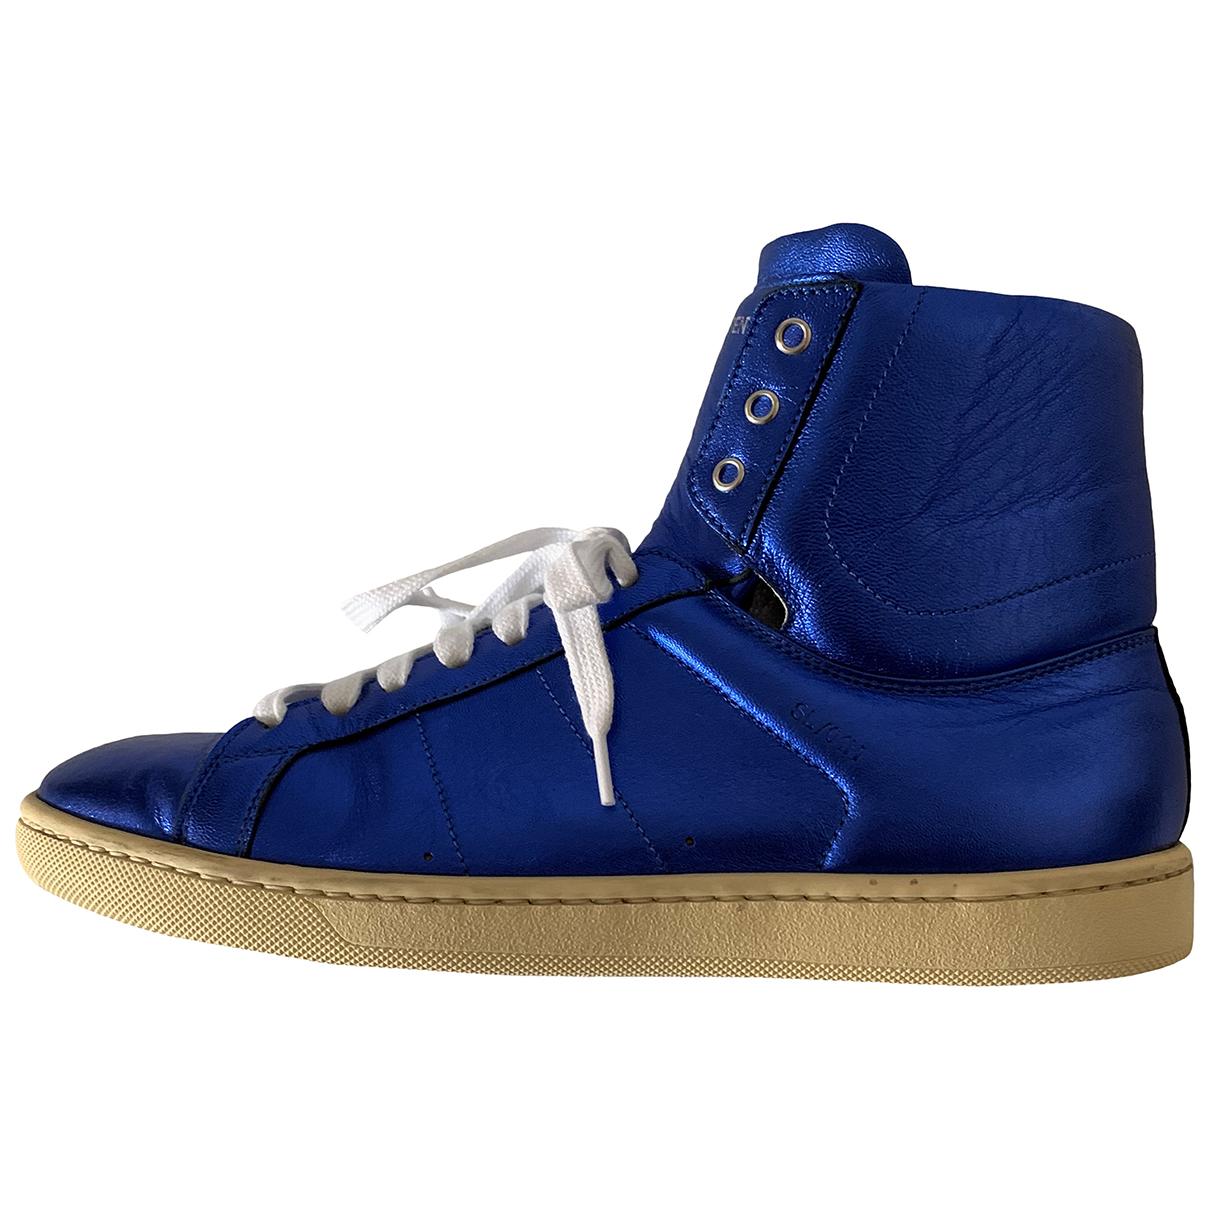 Saint Laurent N Blue Leather Trainers for Women 37 EU